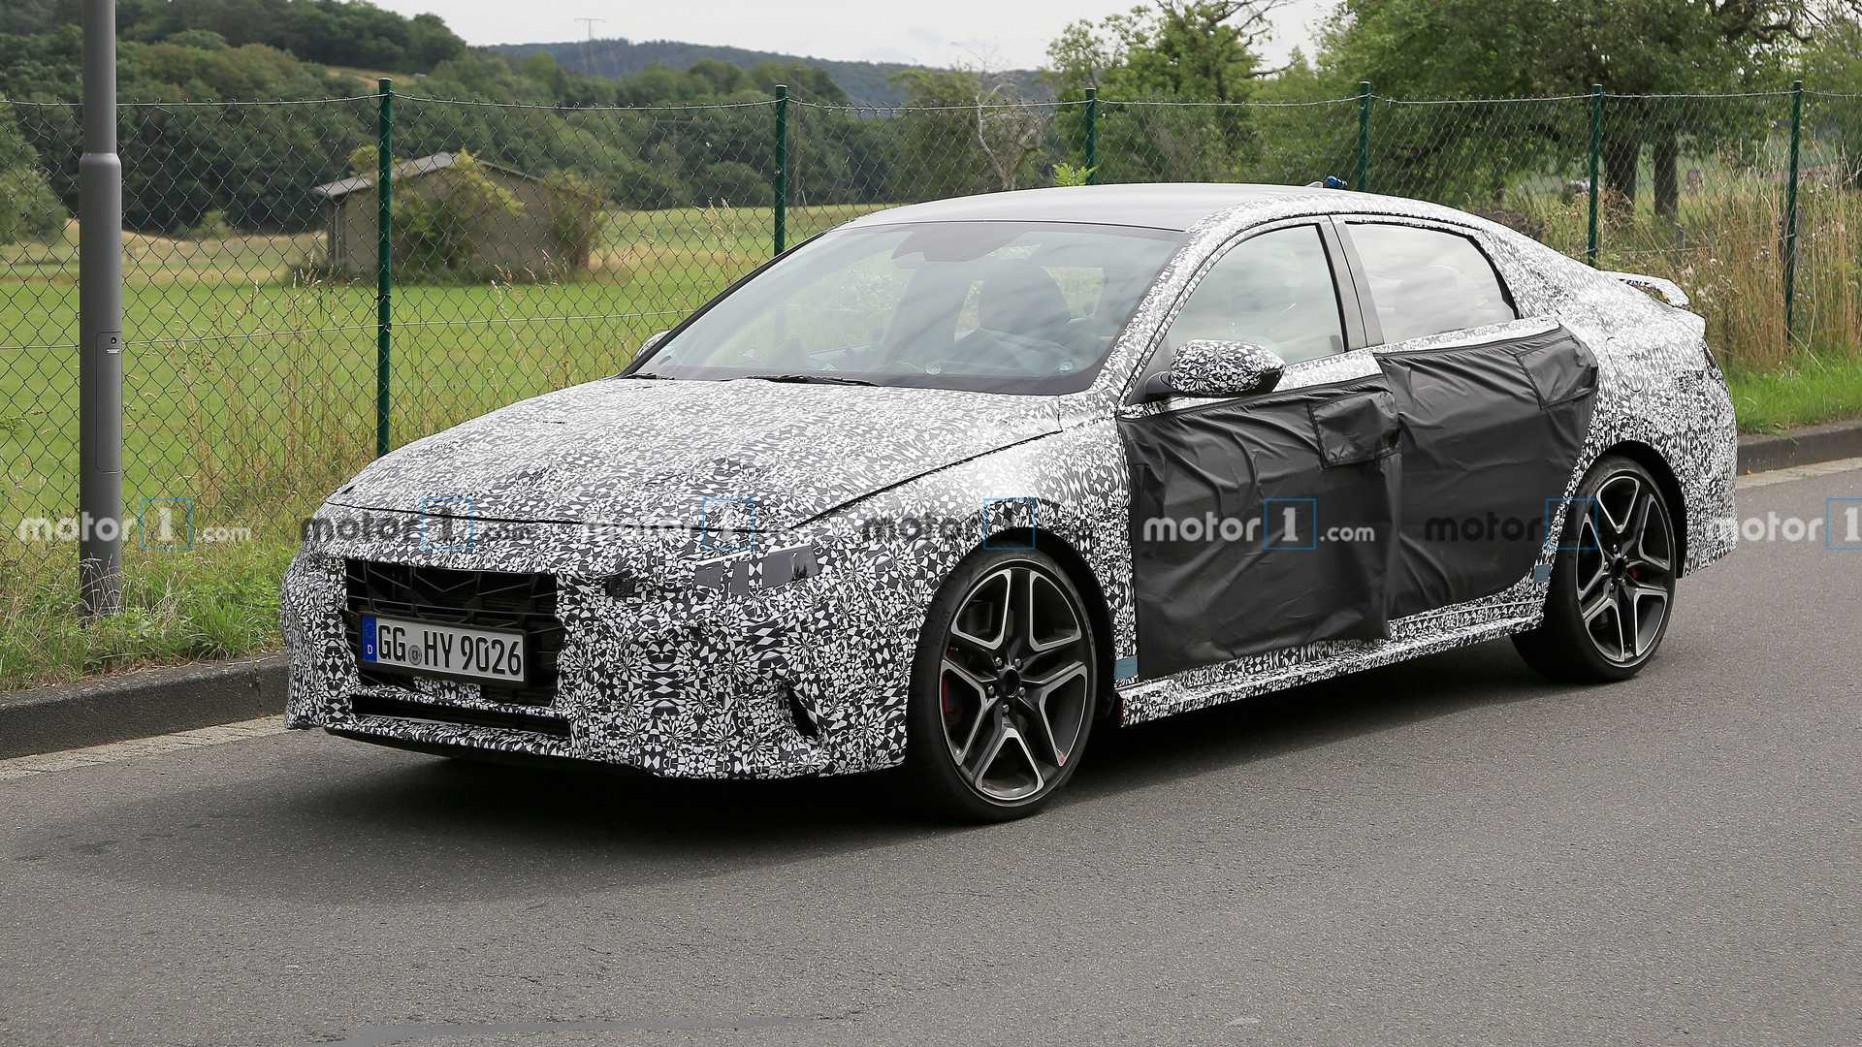 Rumors 2022 Hyundai Elantra Sedan